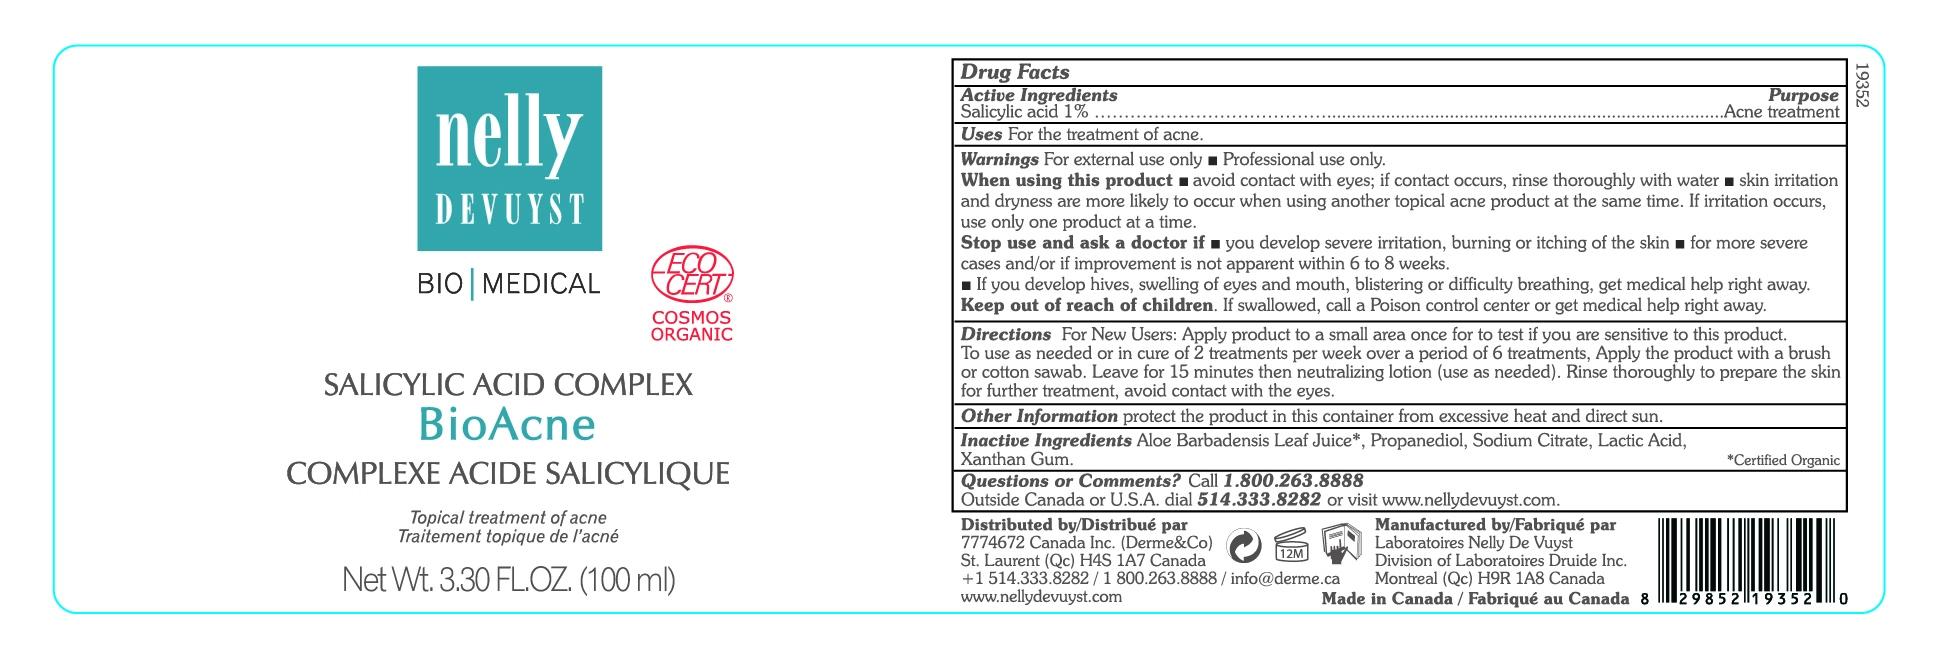 Salicylic Acid Complex BioAcne Peel 100mL